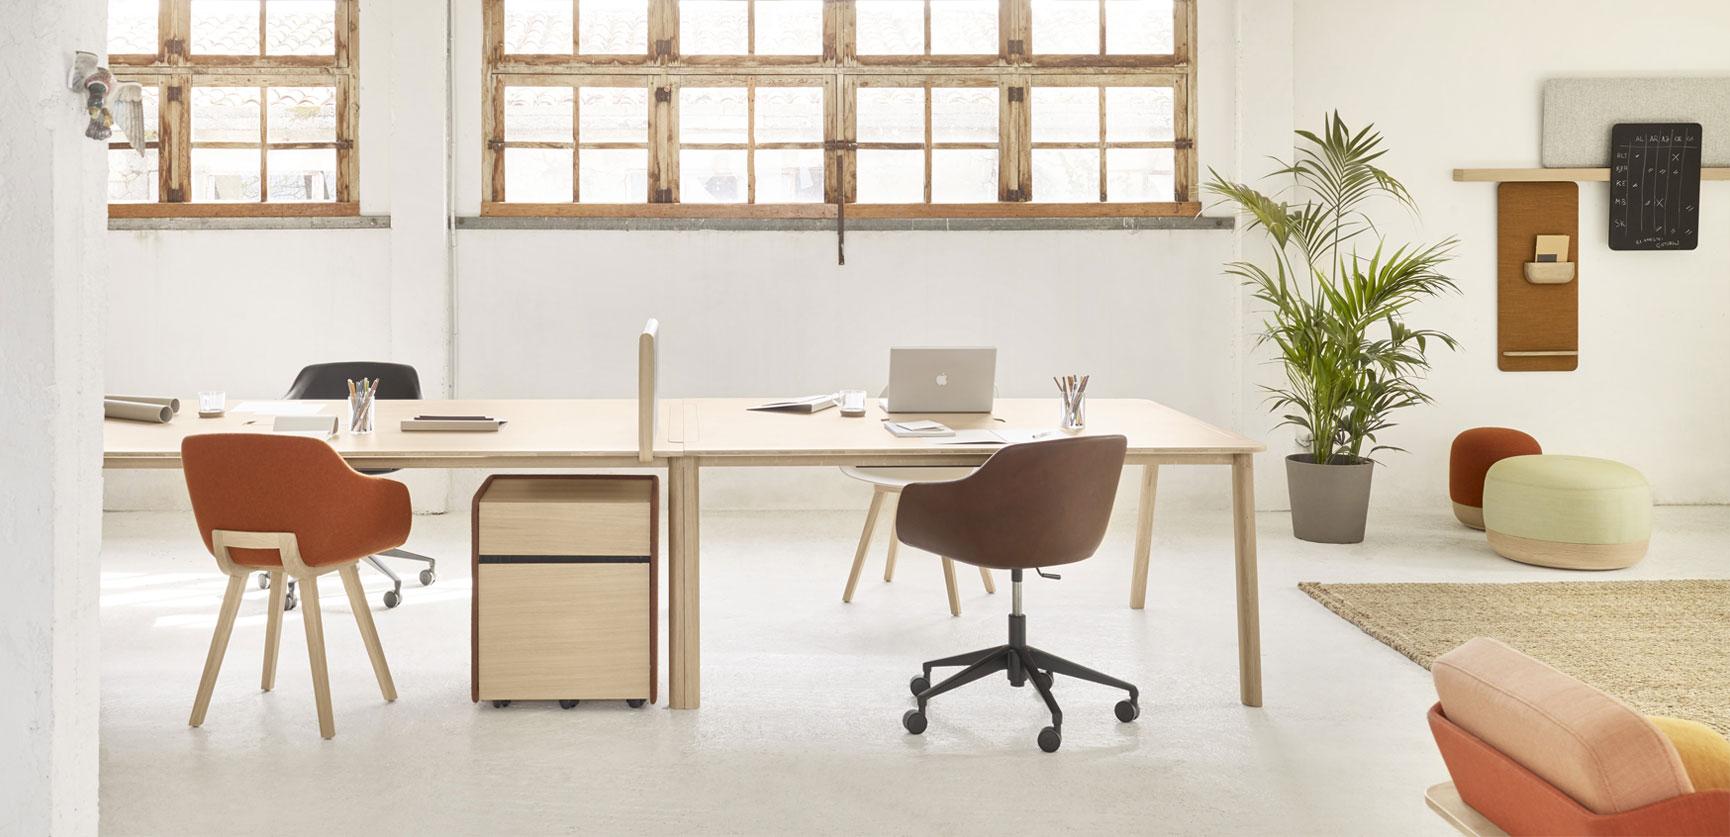 Charmant Introducing Alki Furniture